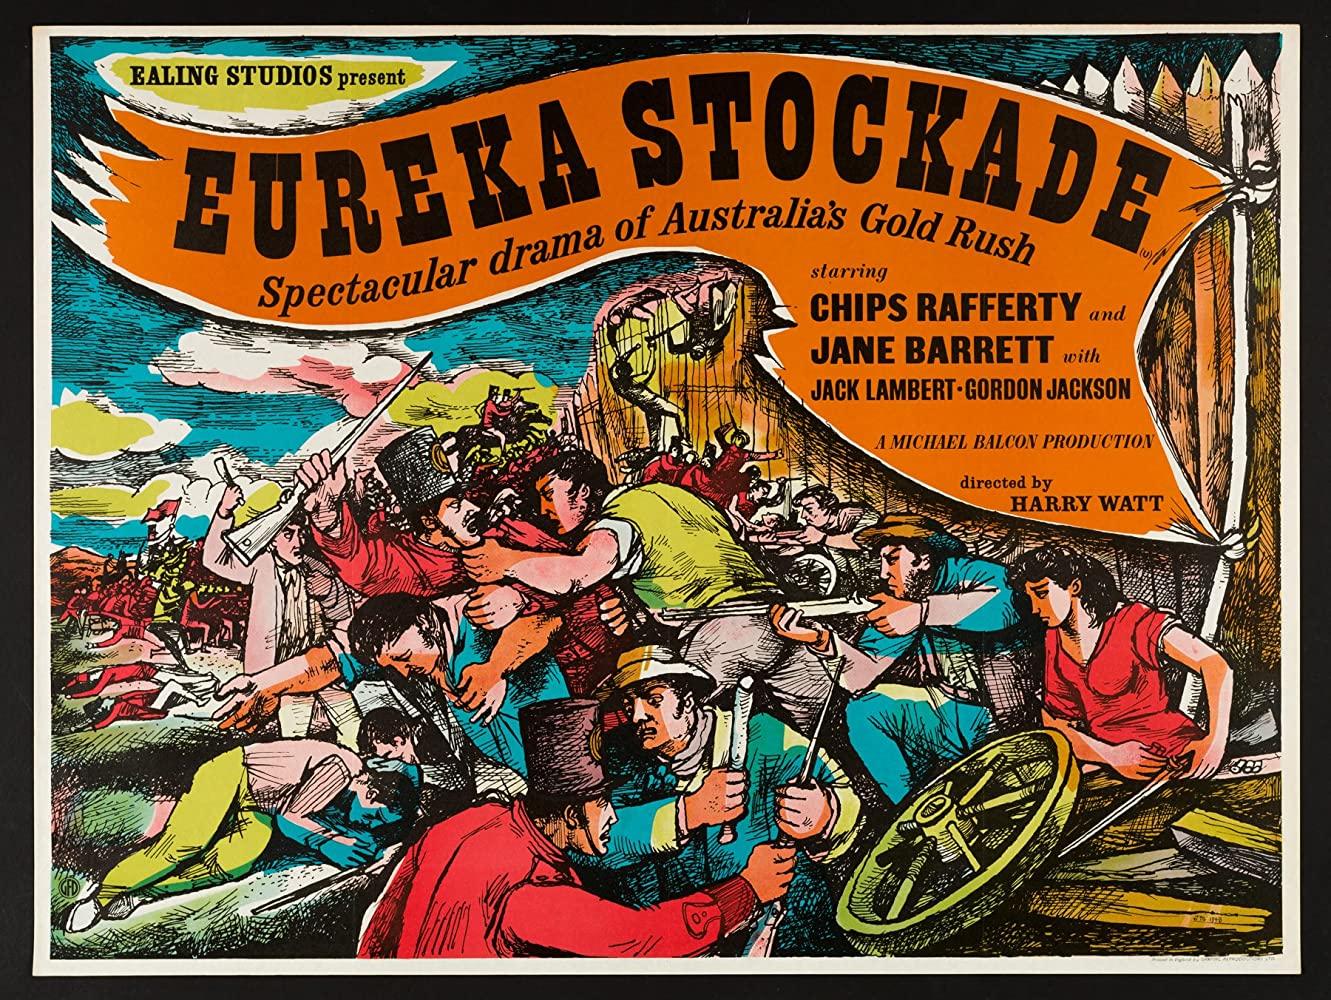 John Minton Eureka Stockade